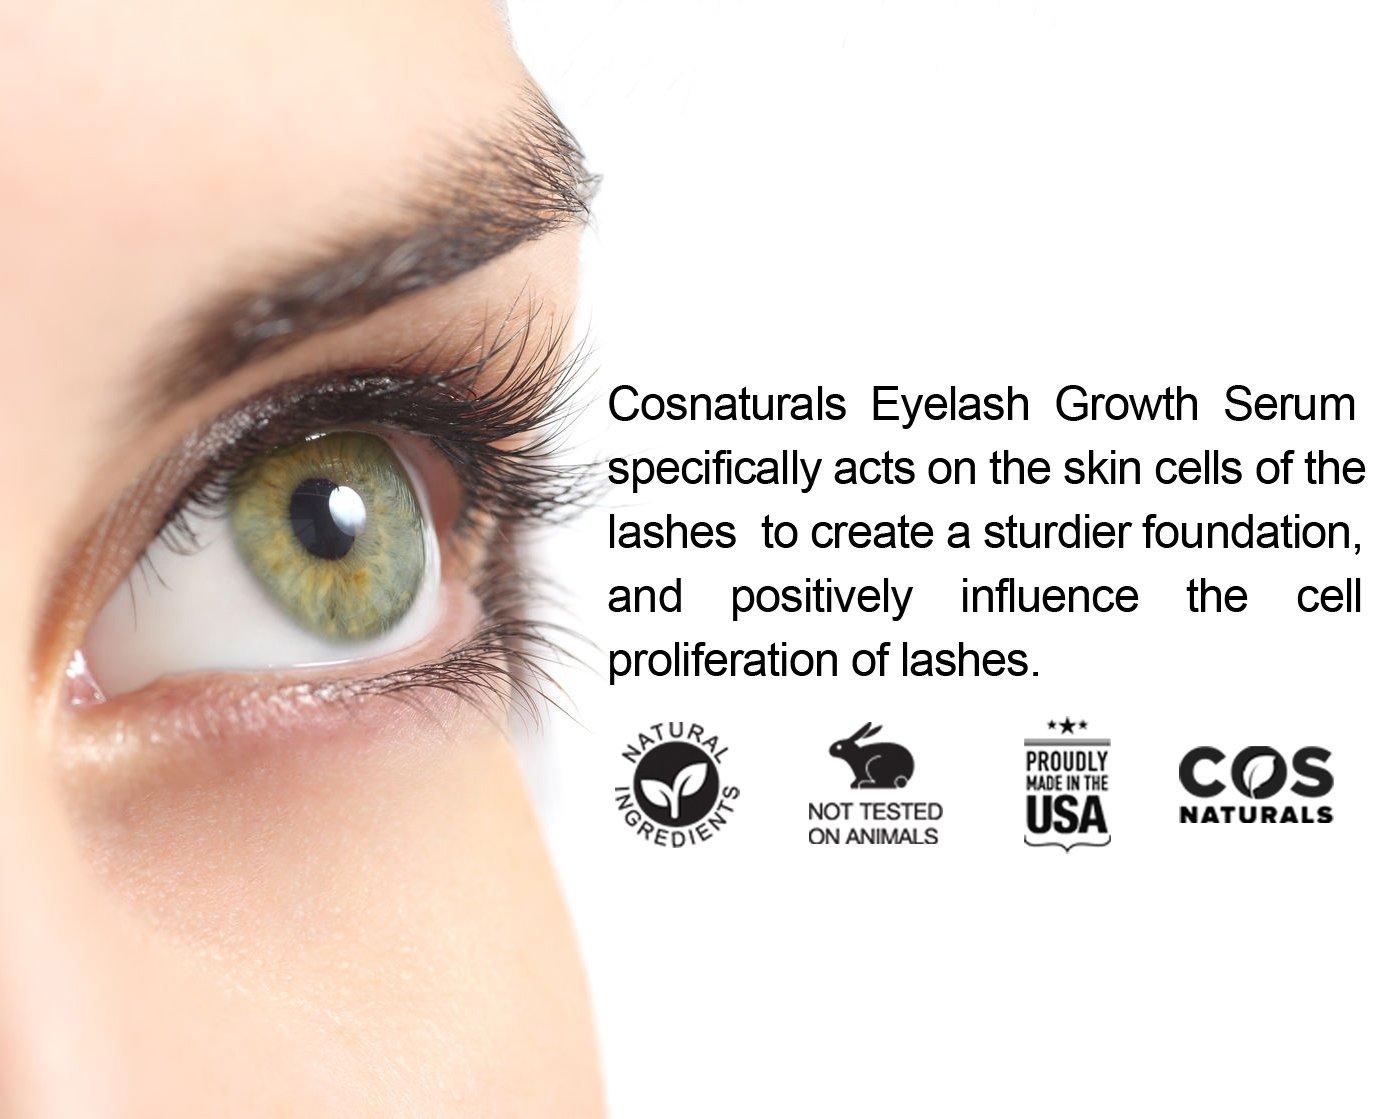 bf1b687acae Amazon.com: COS Naturals Eyelash Growth Serum PEPTIDE LASH Natural Regrowth  Plant Stem Cells Enhancing Treatment For Longer Fuller Eyelashes Thicker ...